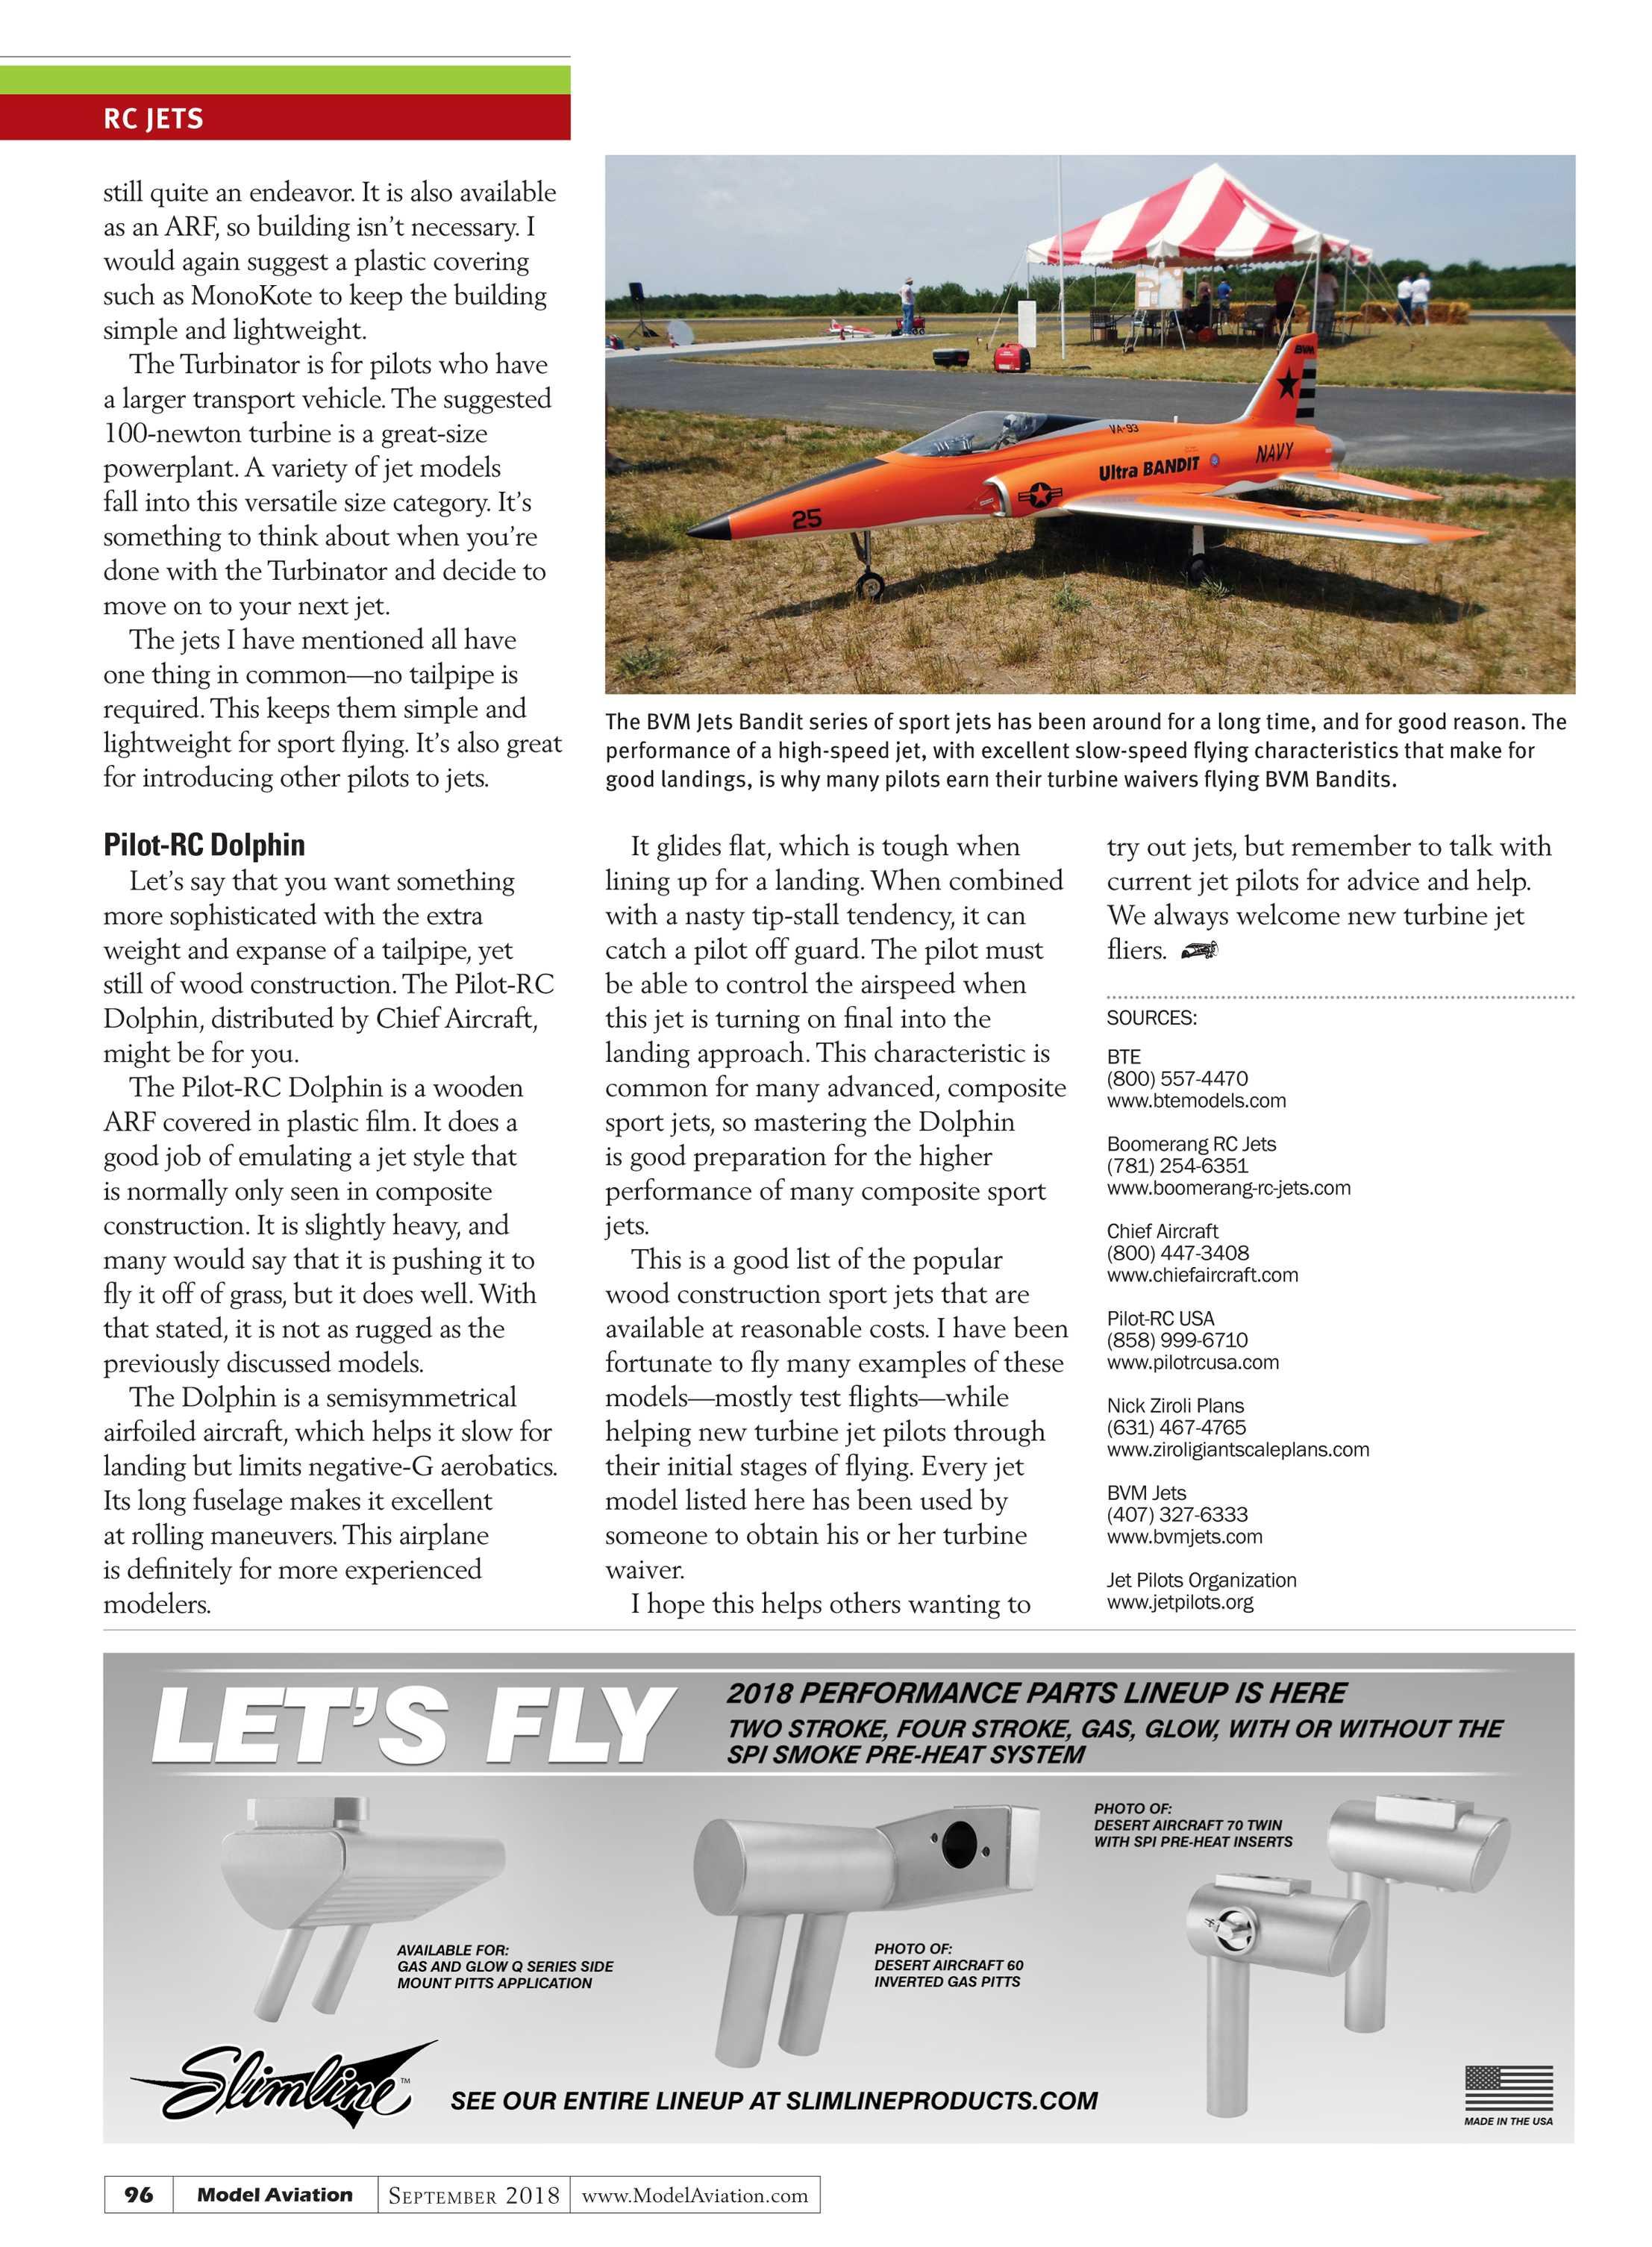 Model Aviation - September 2018 - page 95